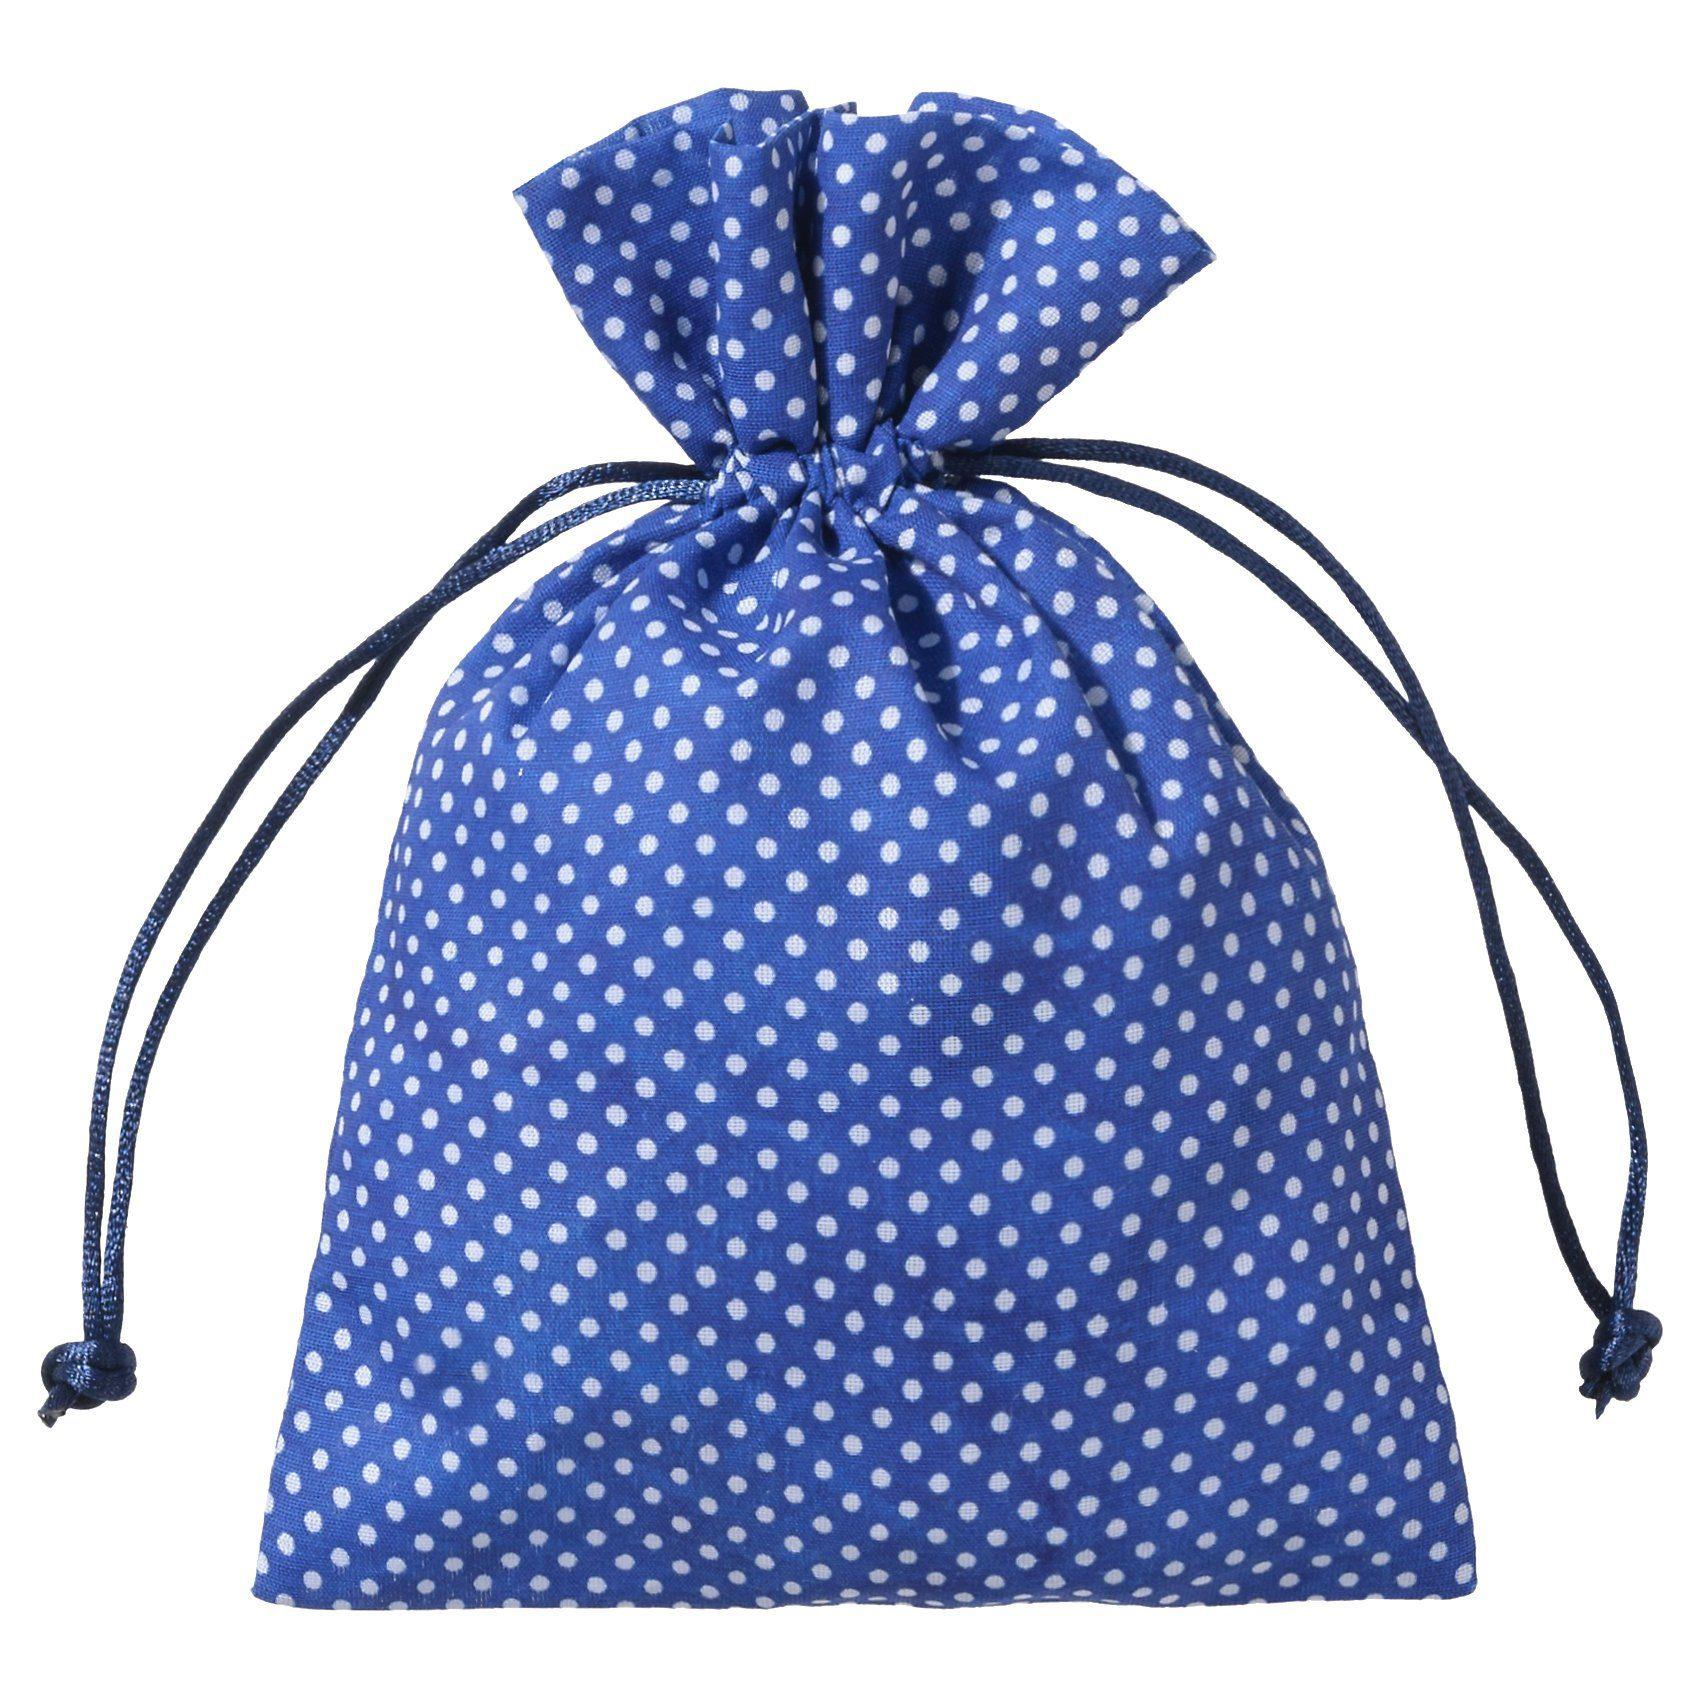 Hotex Stoffbeutel 13 x 18 cm Punkte blau, 12 Stück